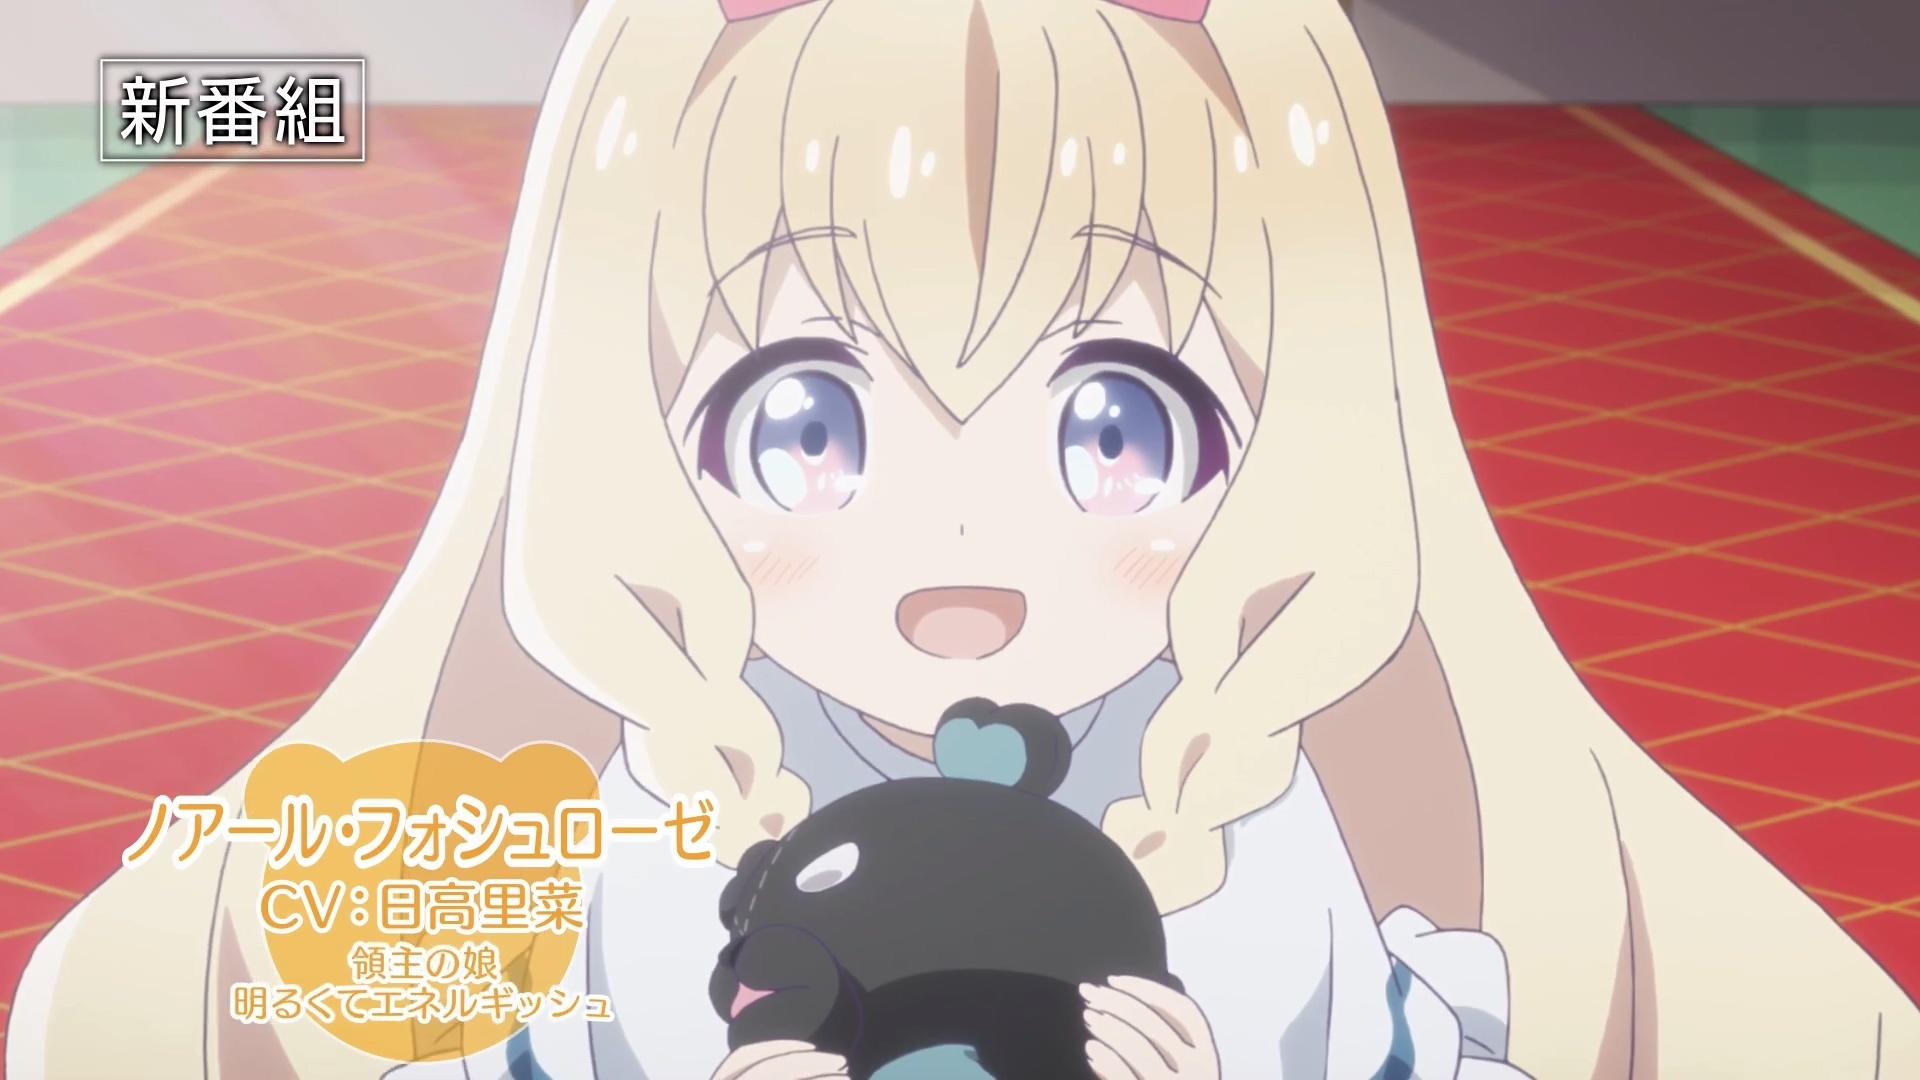 TV动画《熊熊勇闯异世界》CM视频公开,10月开播-